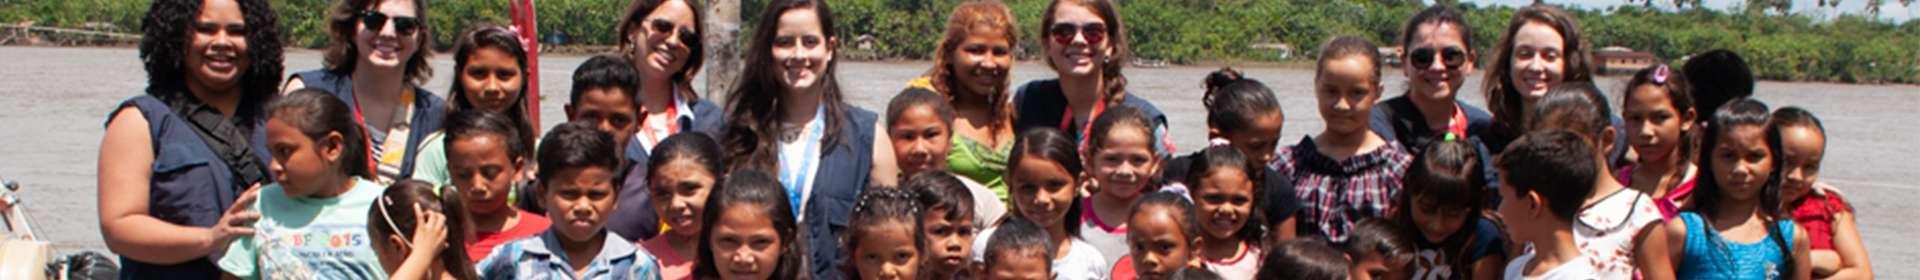 6ª Missão Amazônia chega ao fim